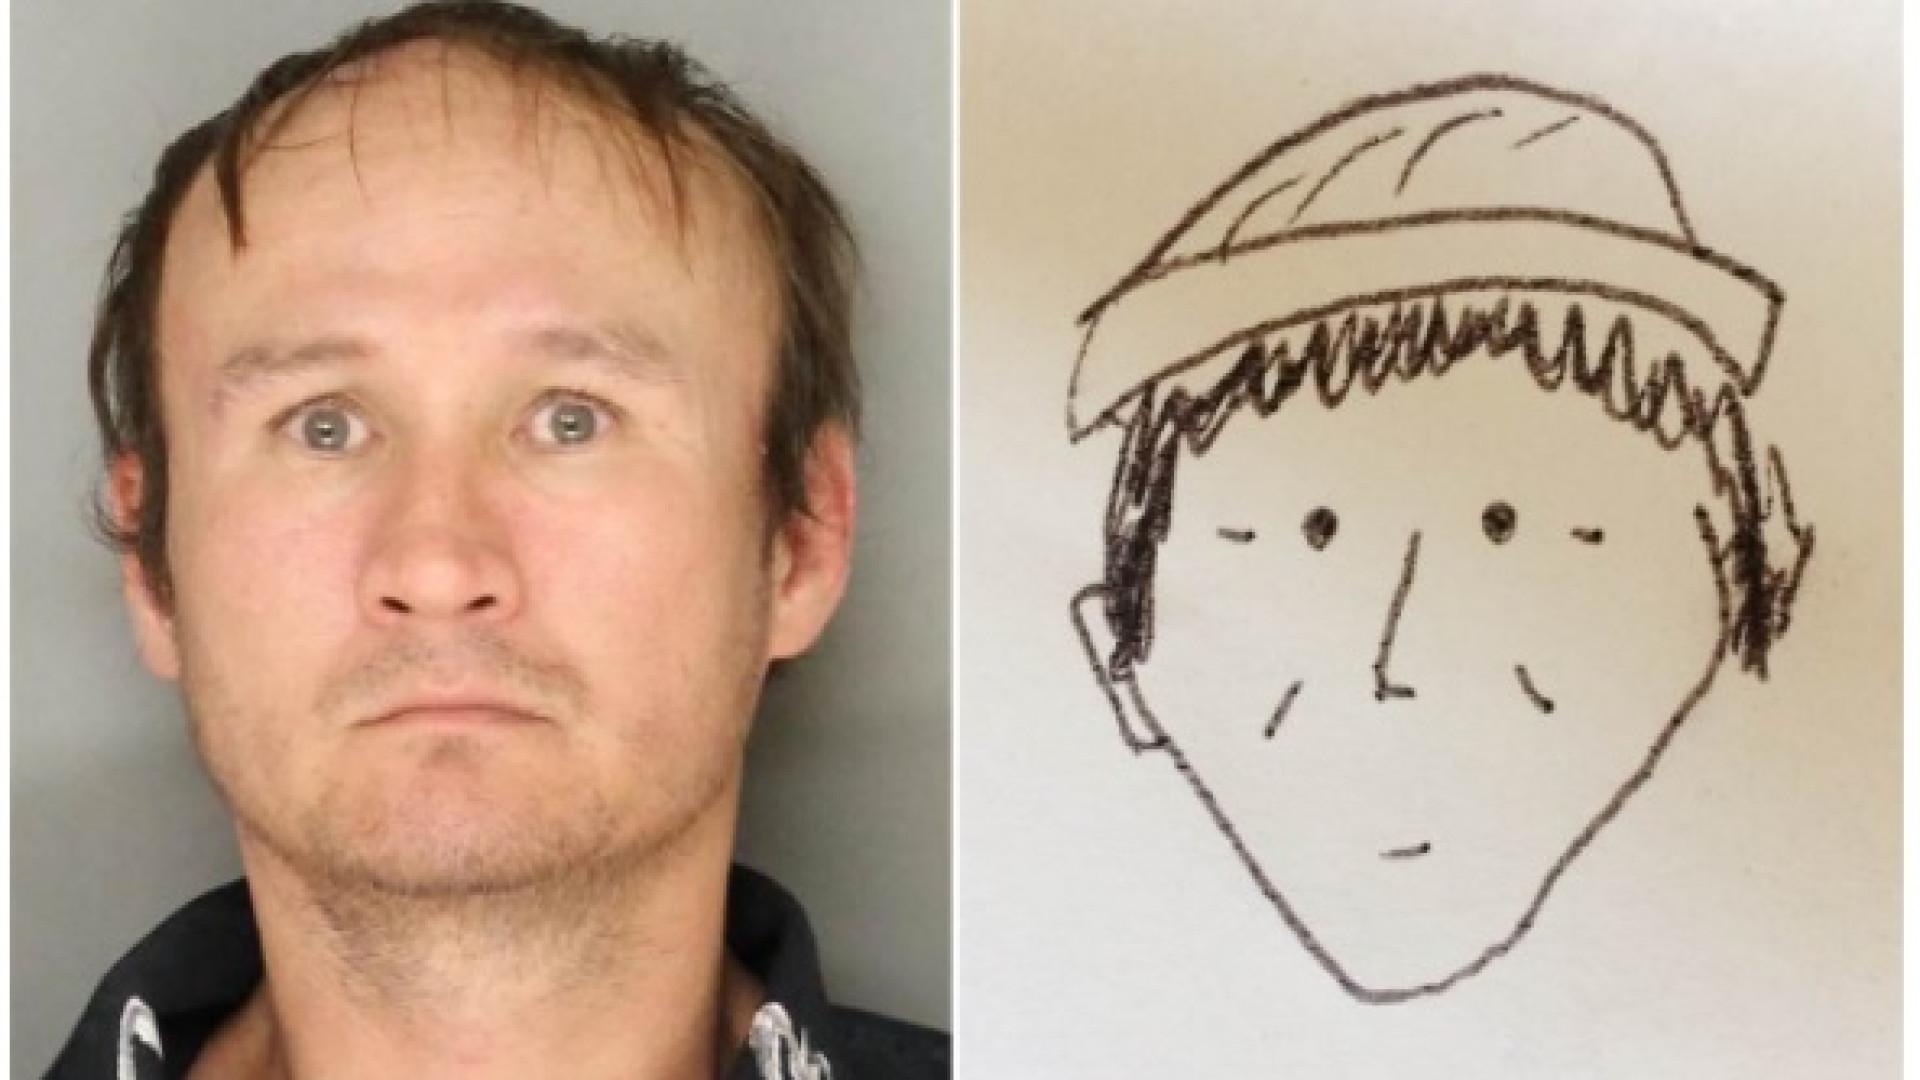 Com este esboço, polícia conseguiu identificar suspeito de roubo